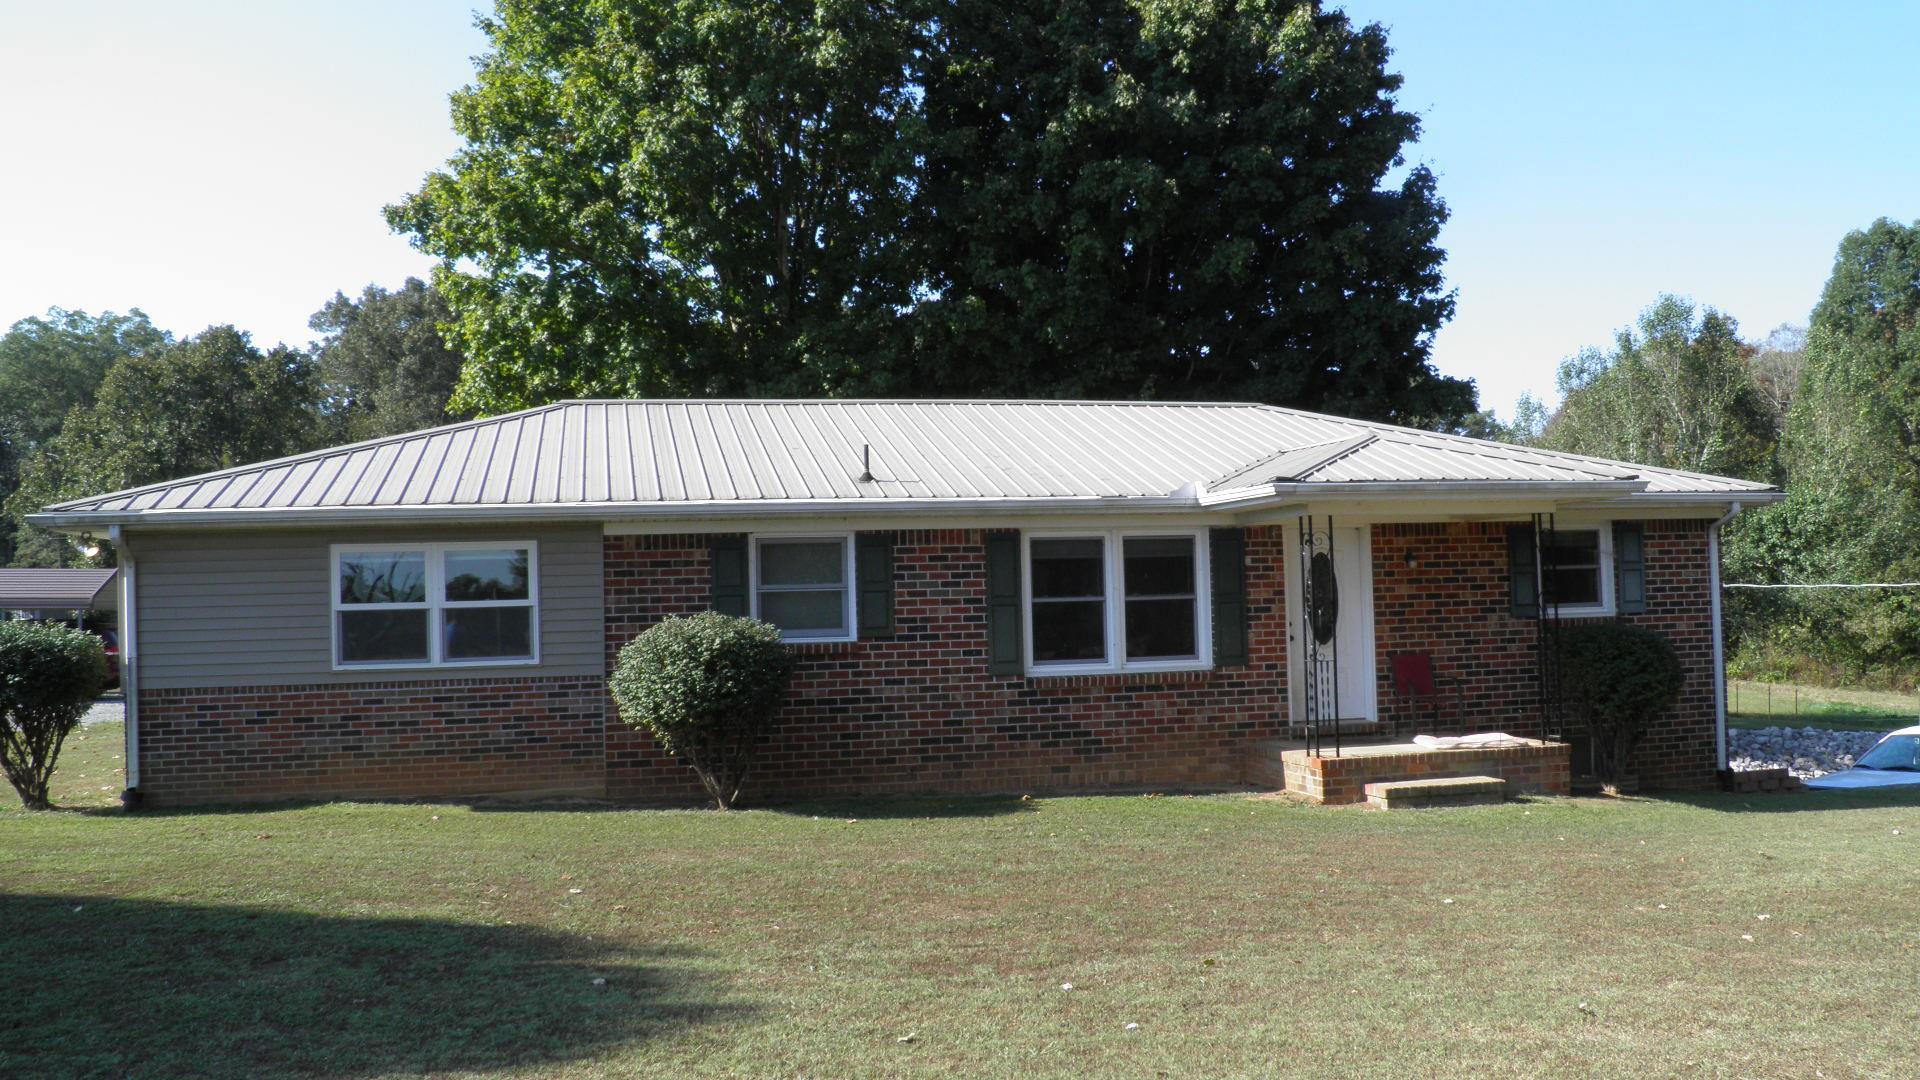 2630 Smoot Rd, Morrison, TN 37357 - Morrison, TN real estate listing